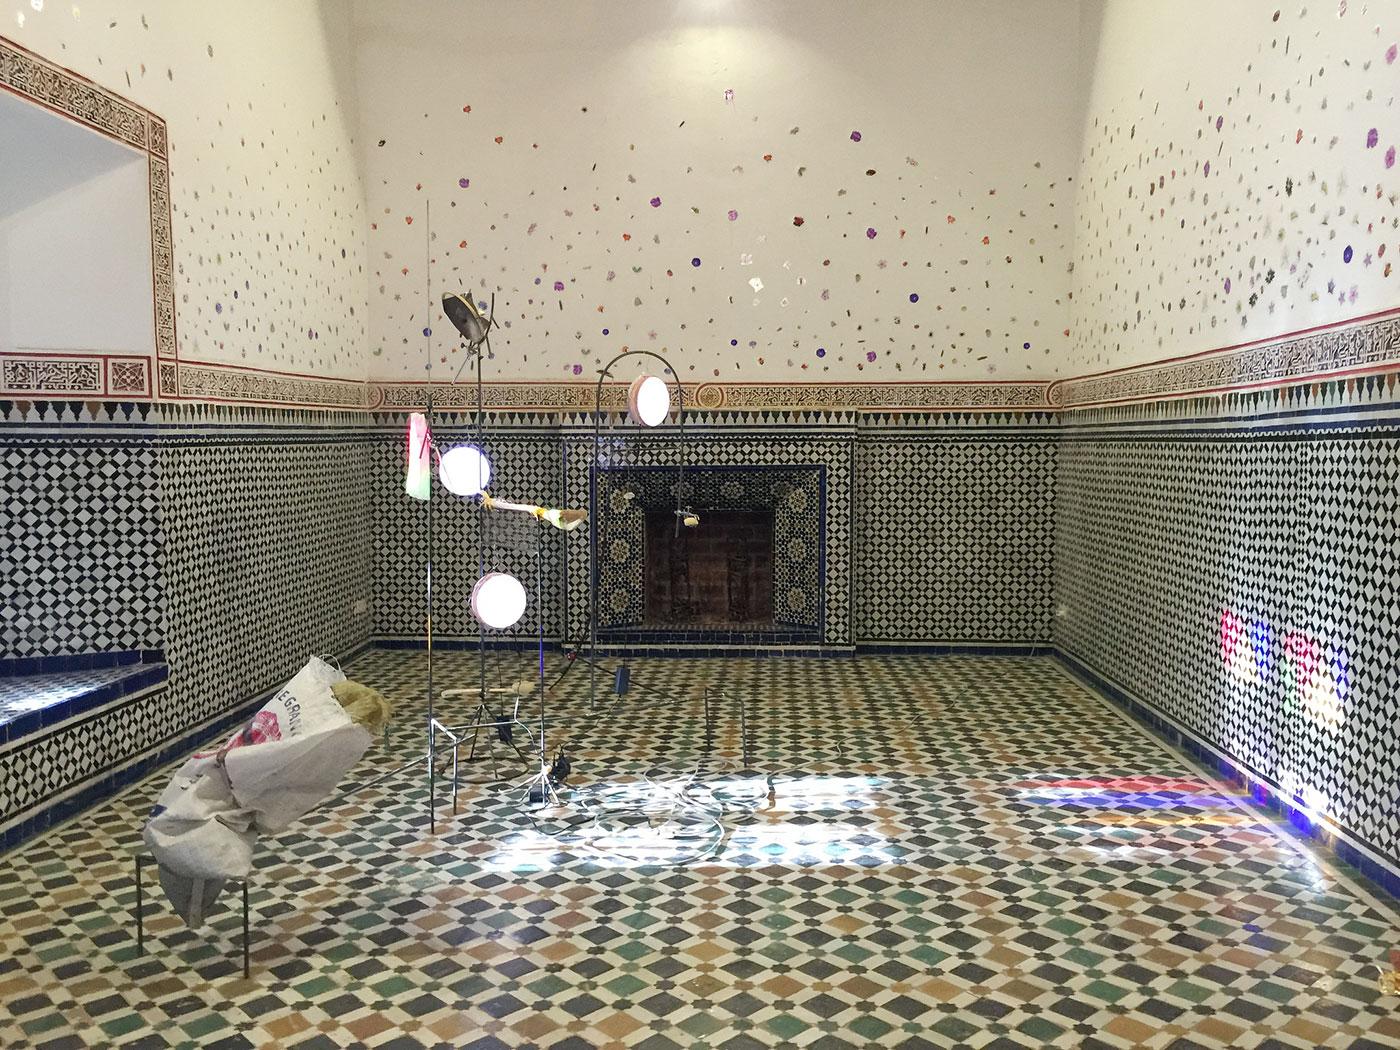 Part of Dineo Seshee Bopape's installation at Bahia Palace.